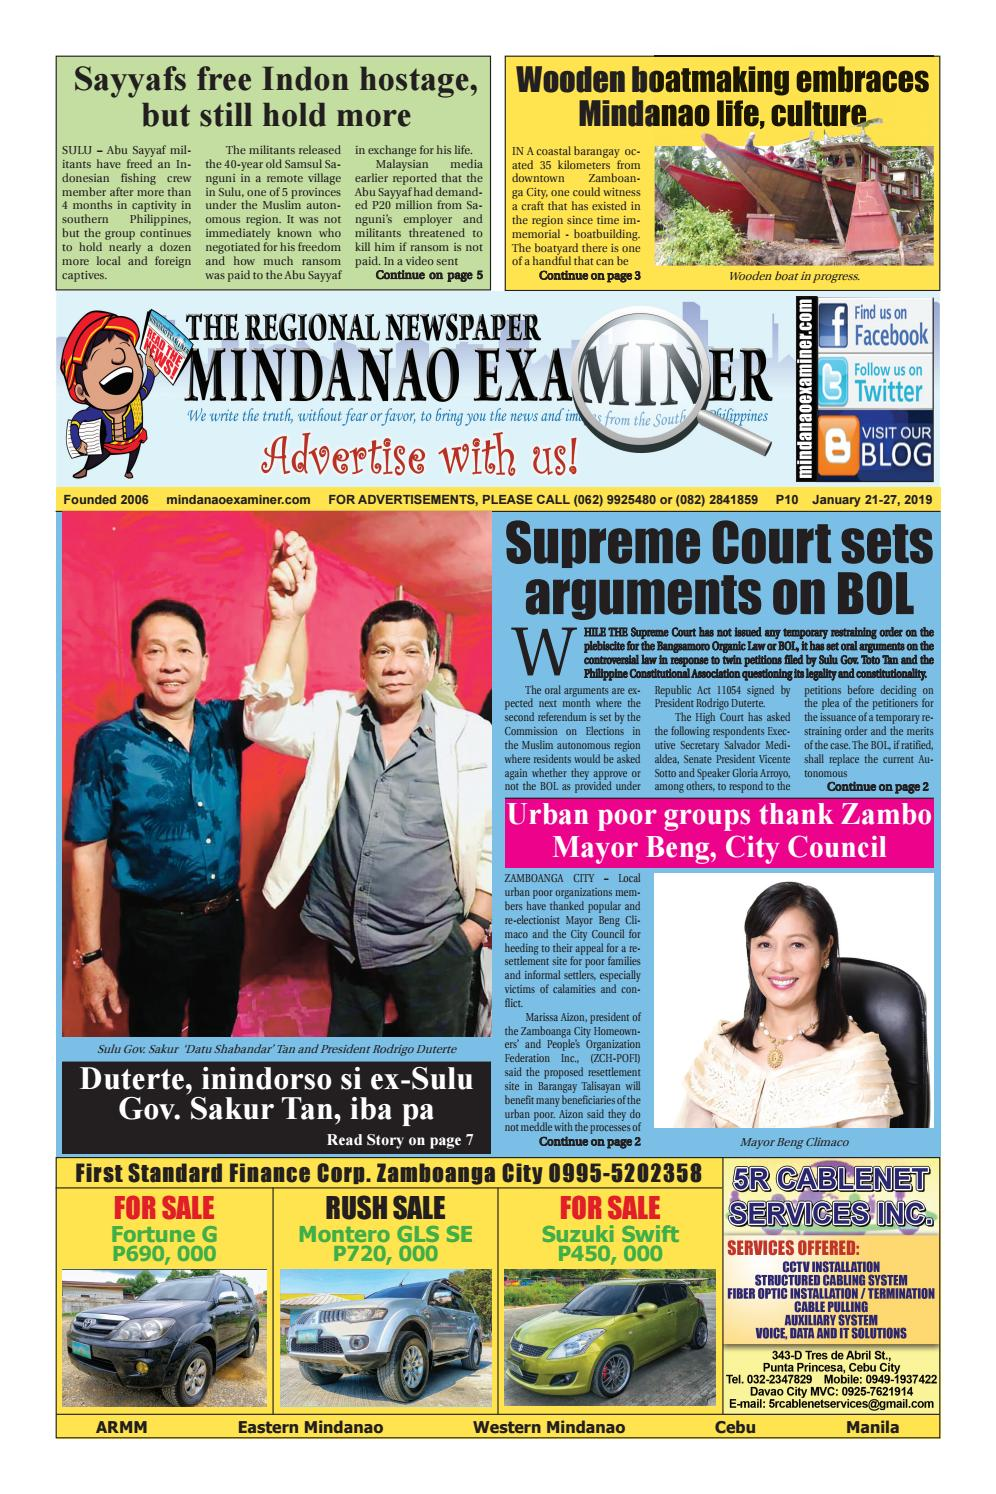 Mindanao Examiner Regional Newspaper (Jan  21-27, 2019) by Mindanao